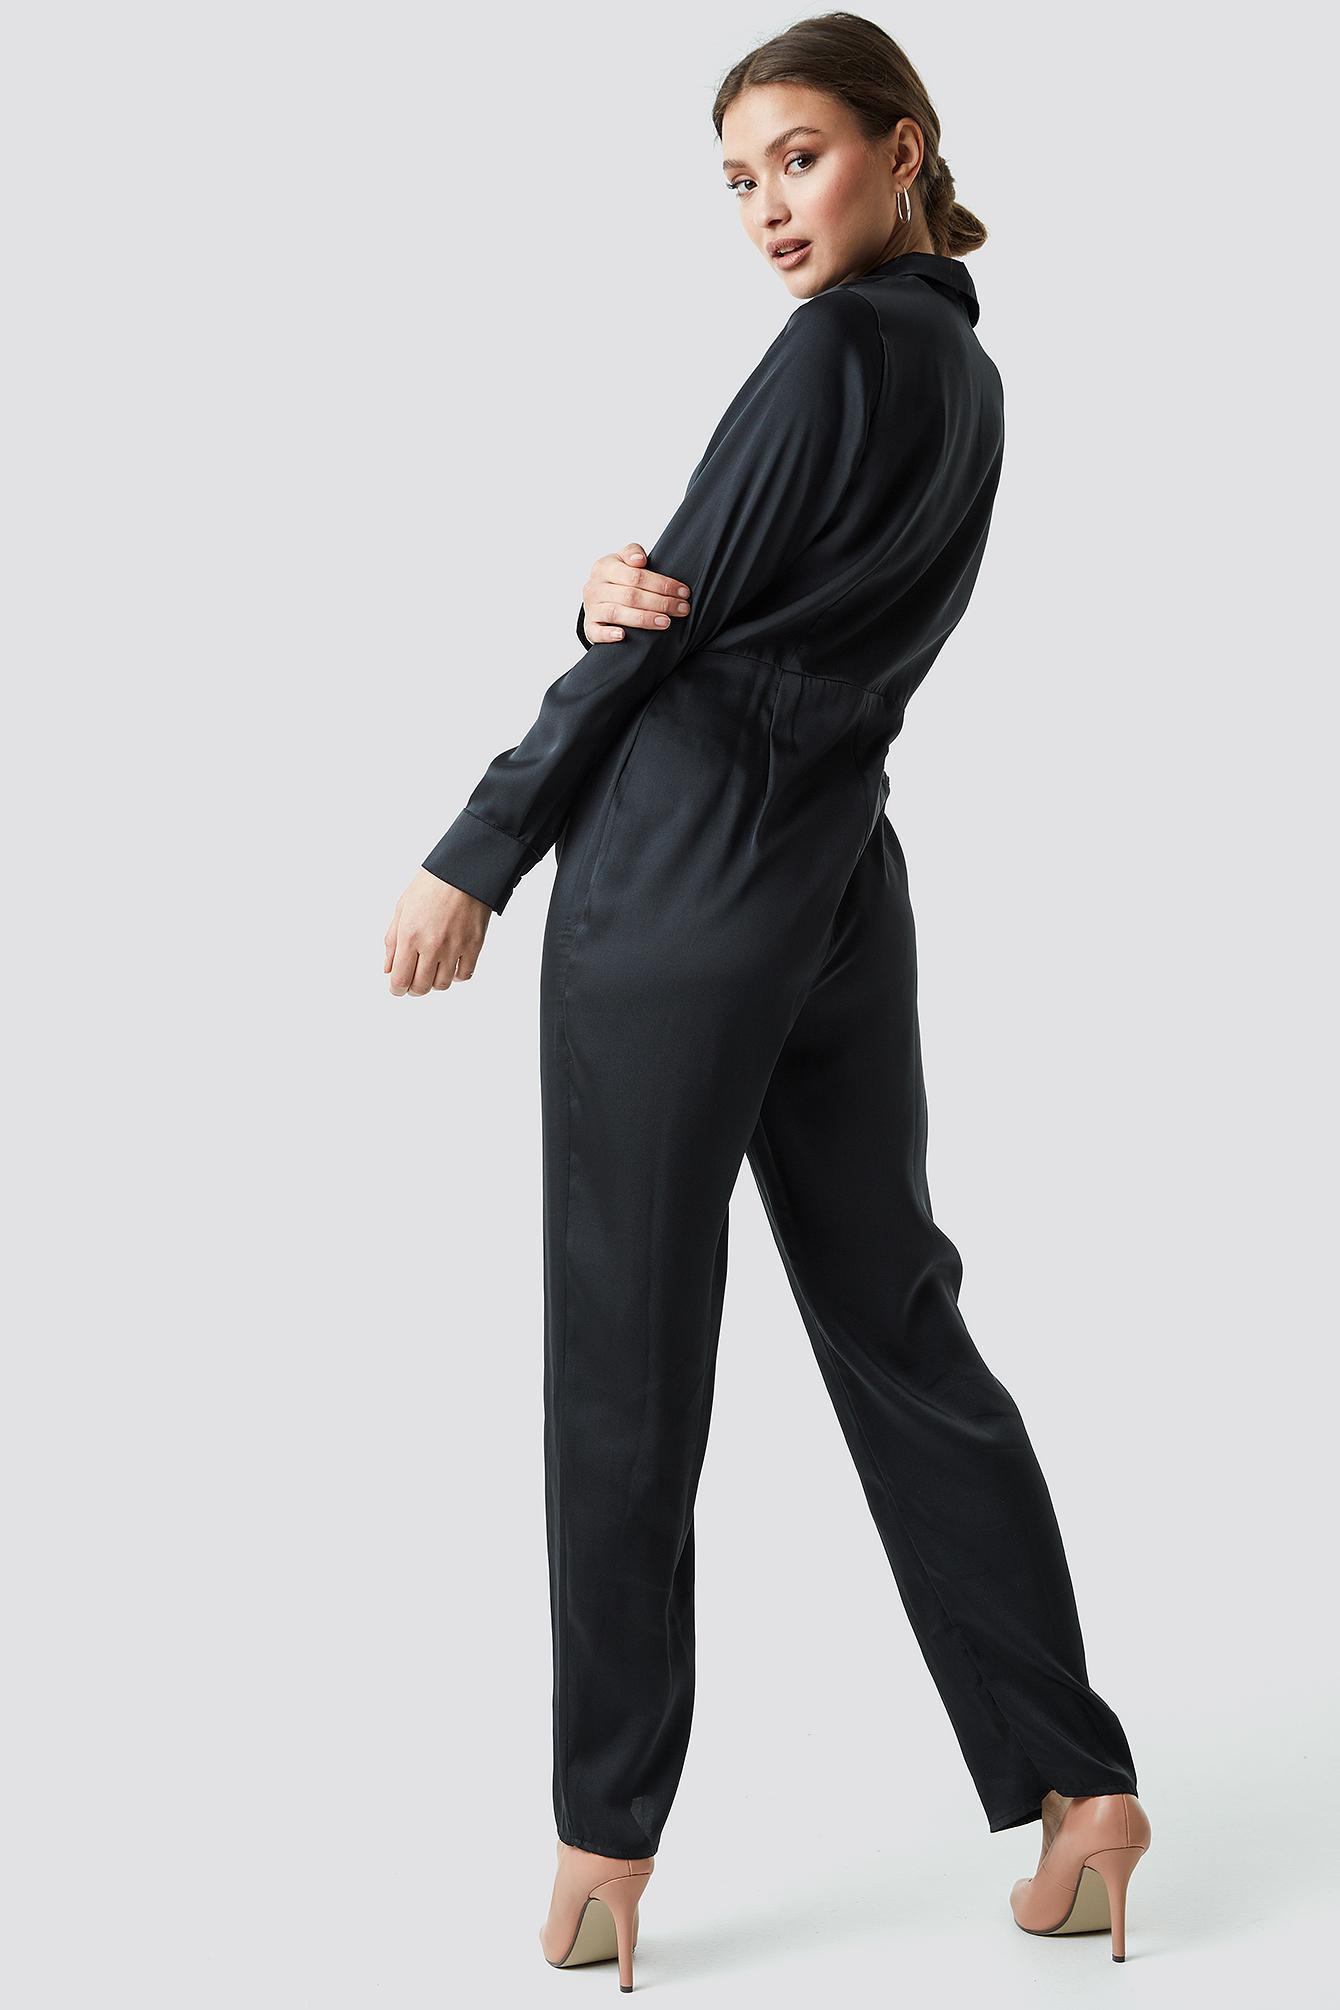 0bd7a0dde45f Lyst - NA-KD Satin Boilersuit Black in Black